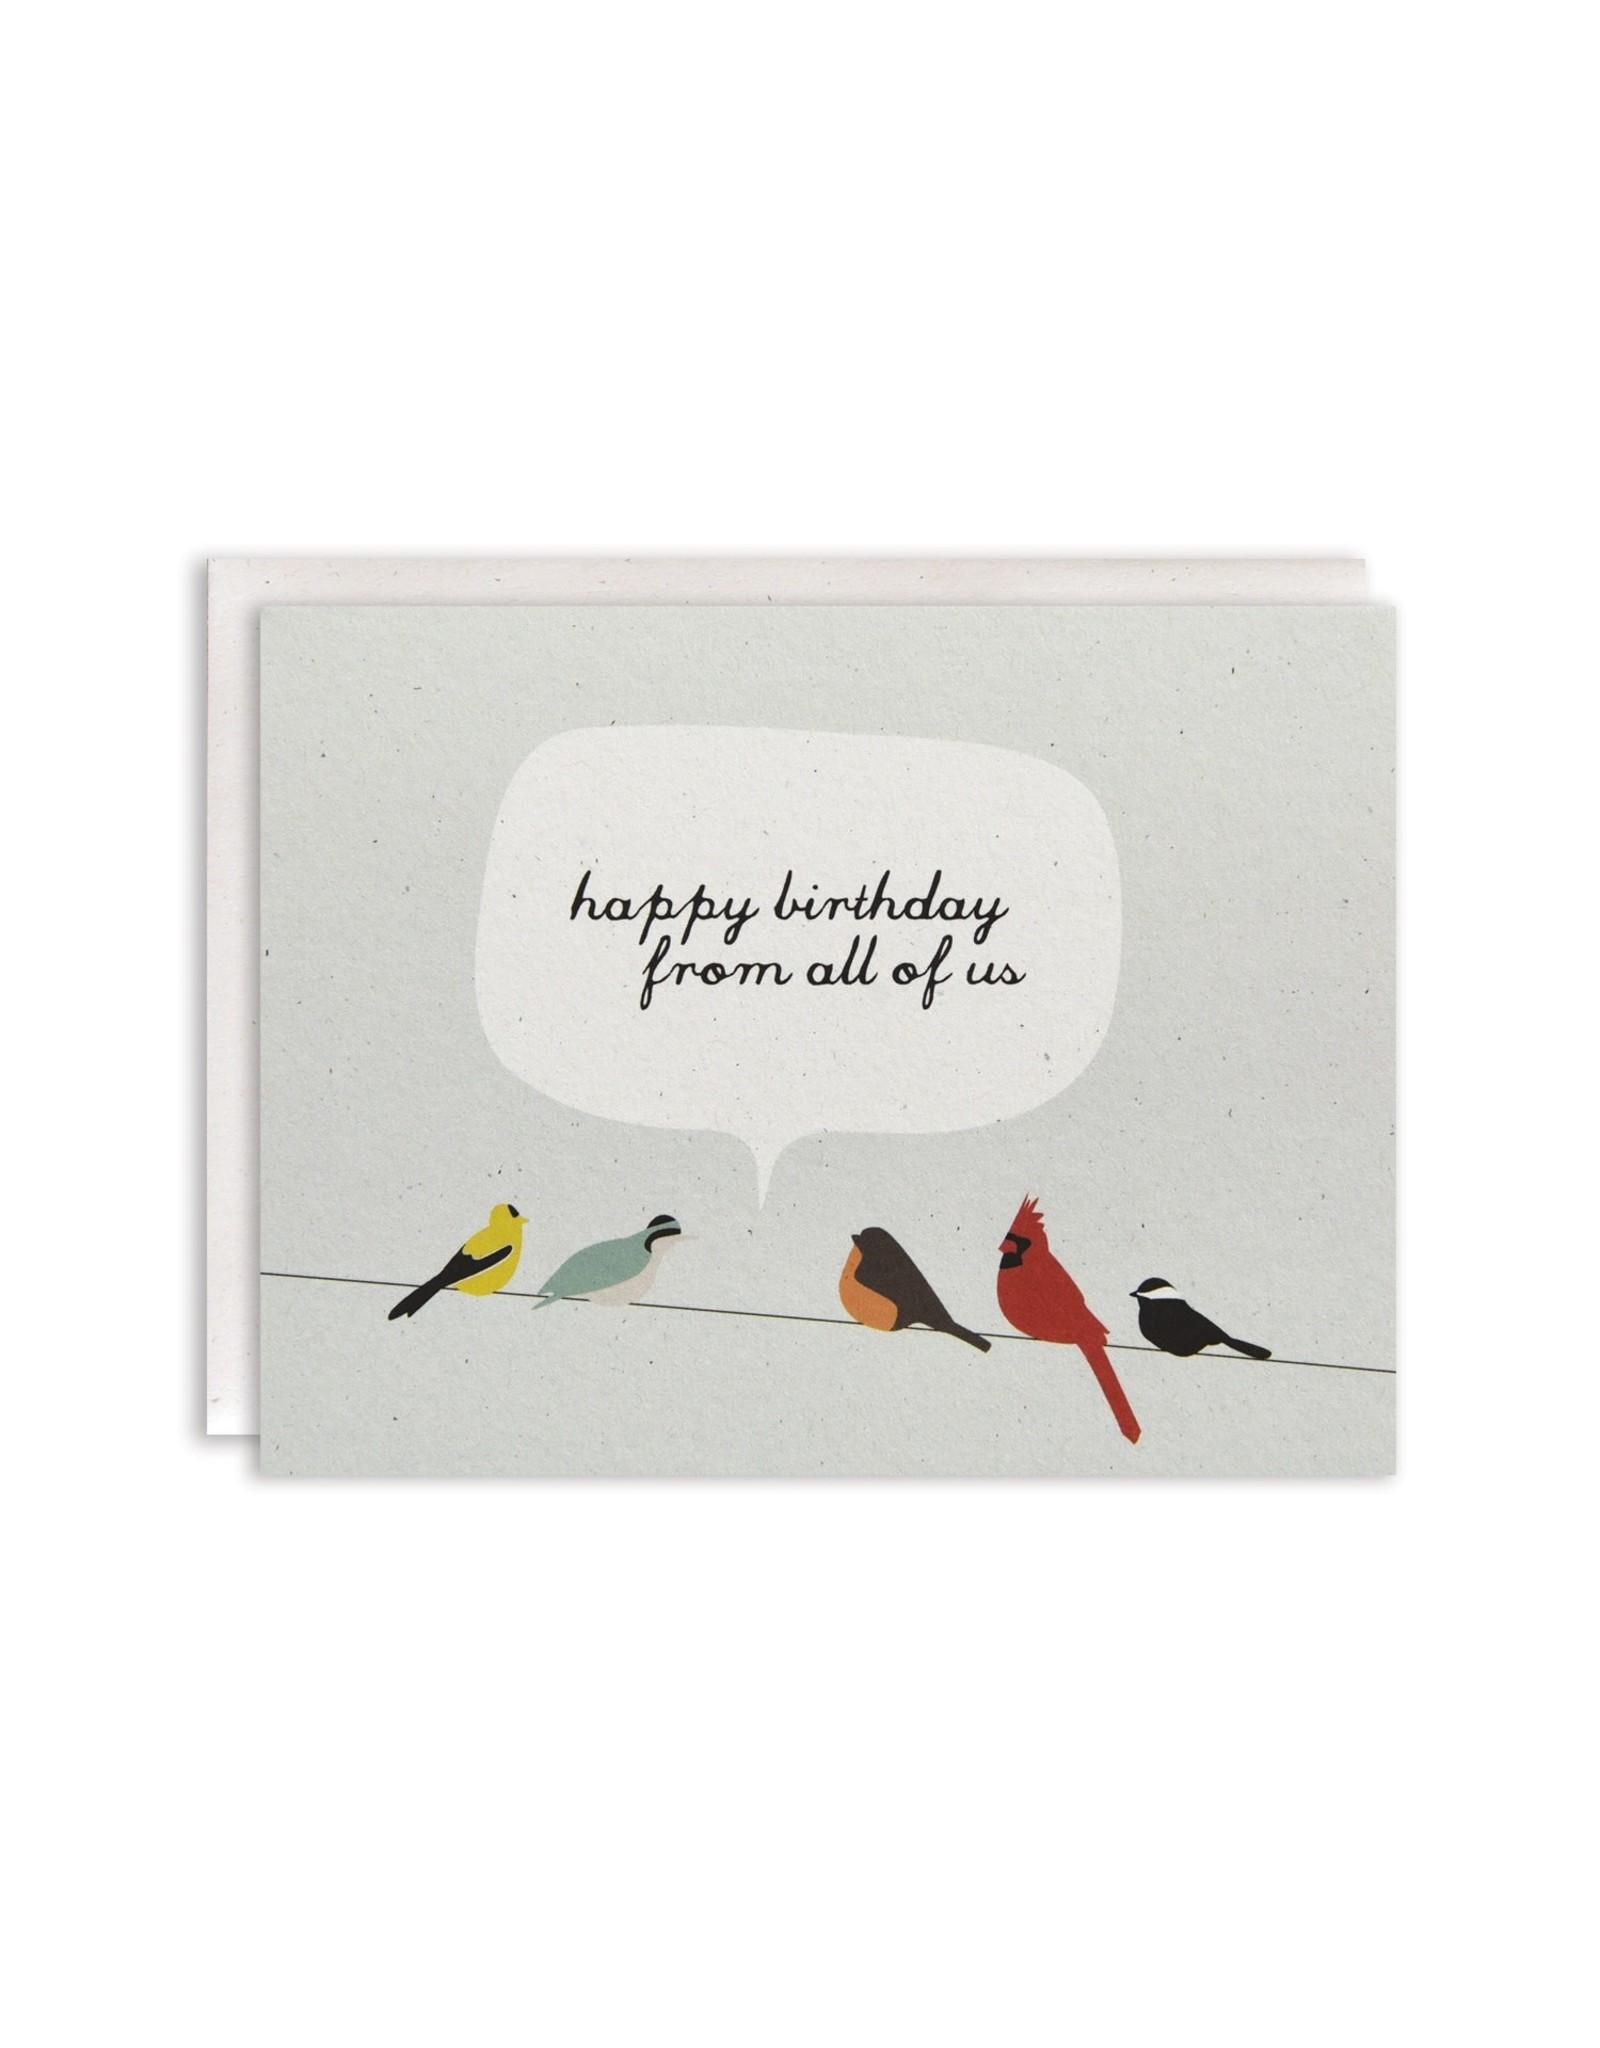 June & December Greeting Card - happy birthday